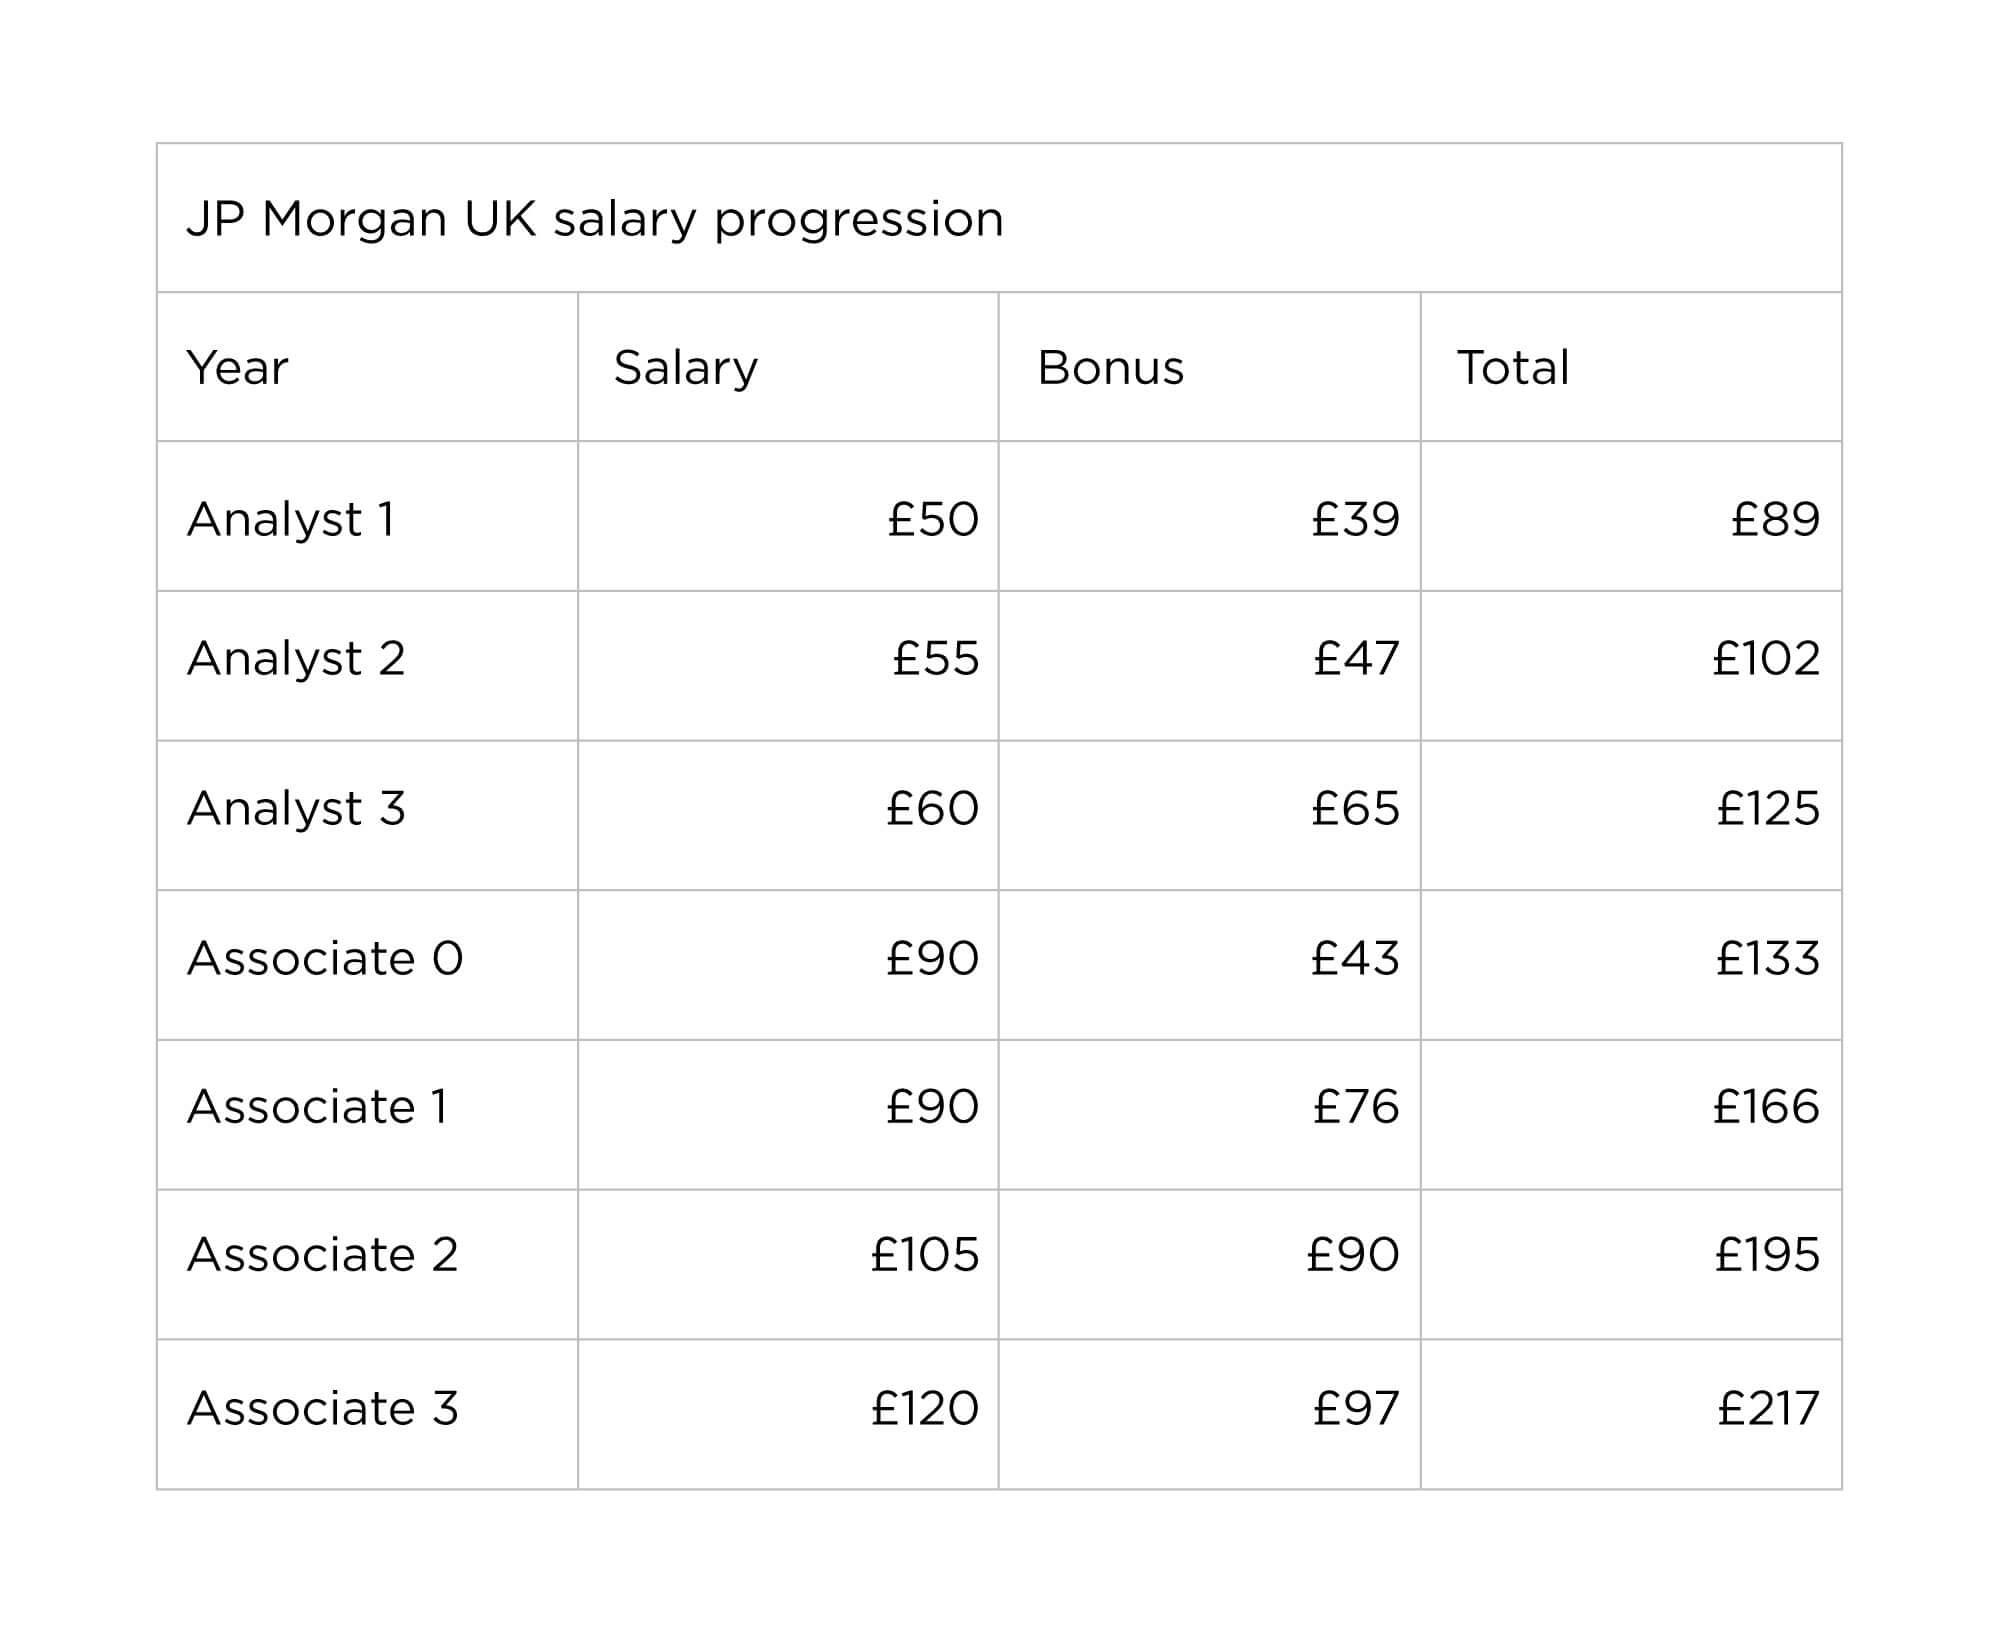 JP Morgan UK salary progression